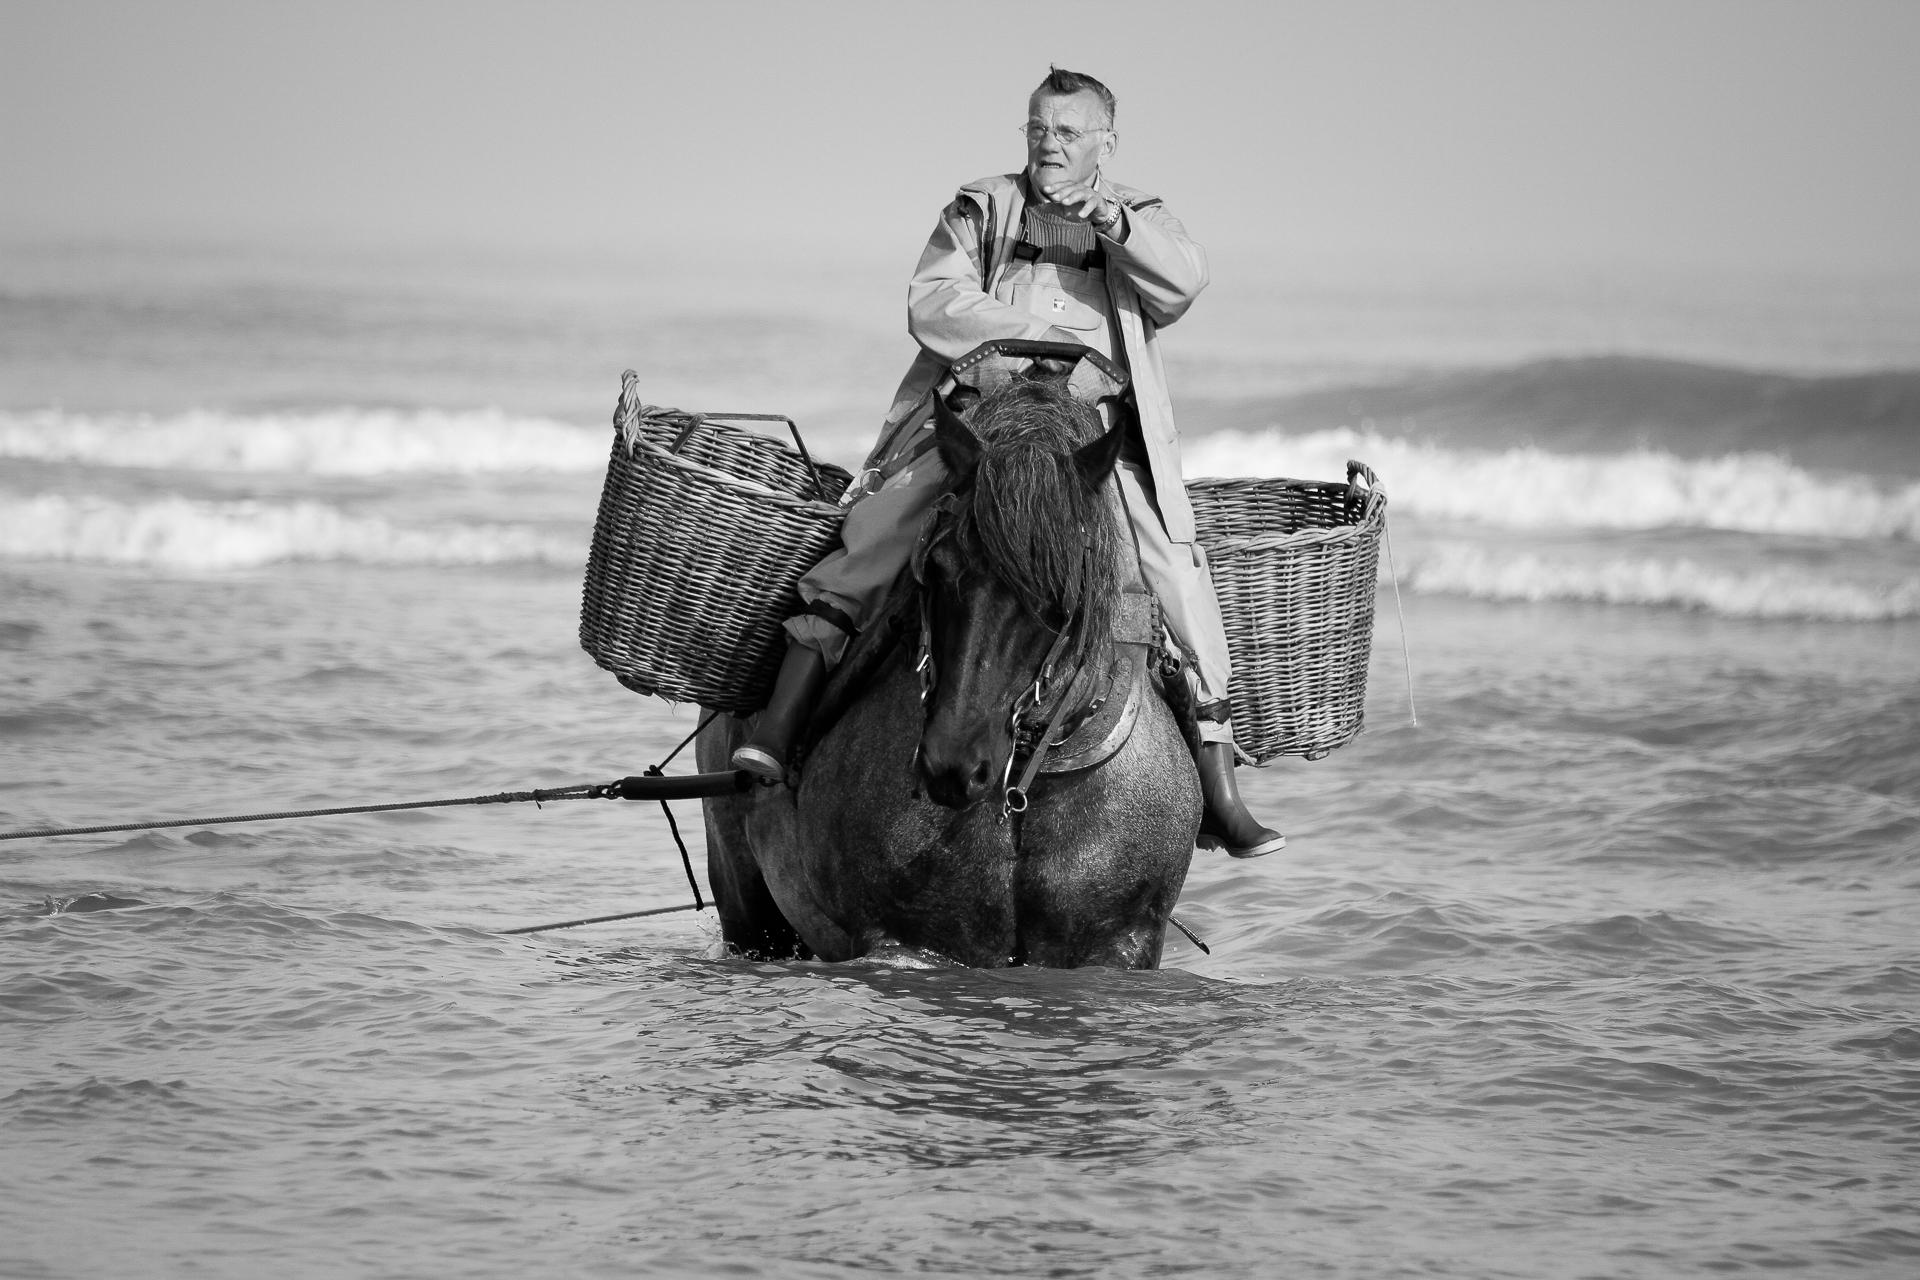 Experienced fisherman